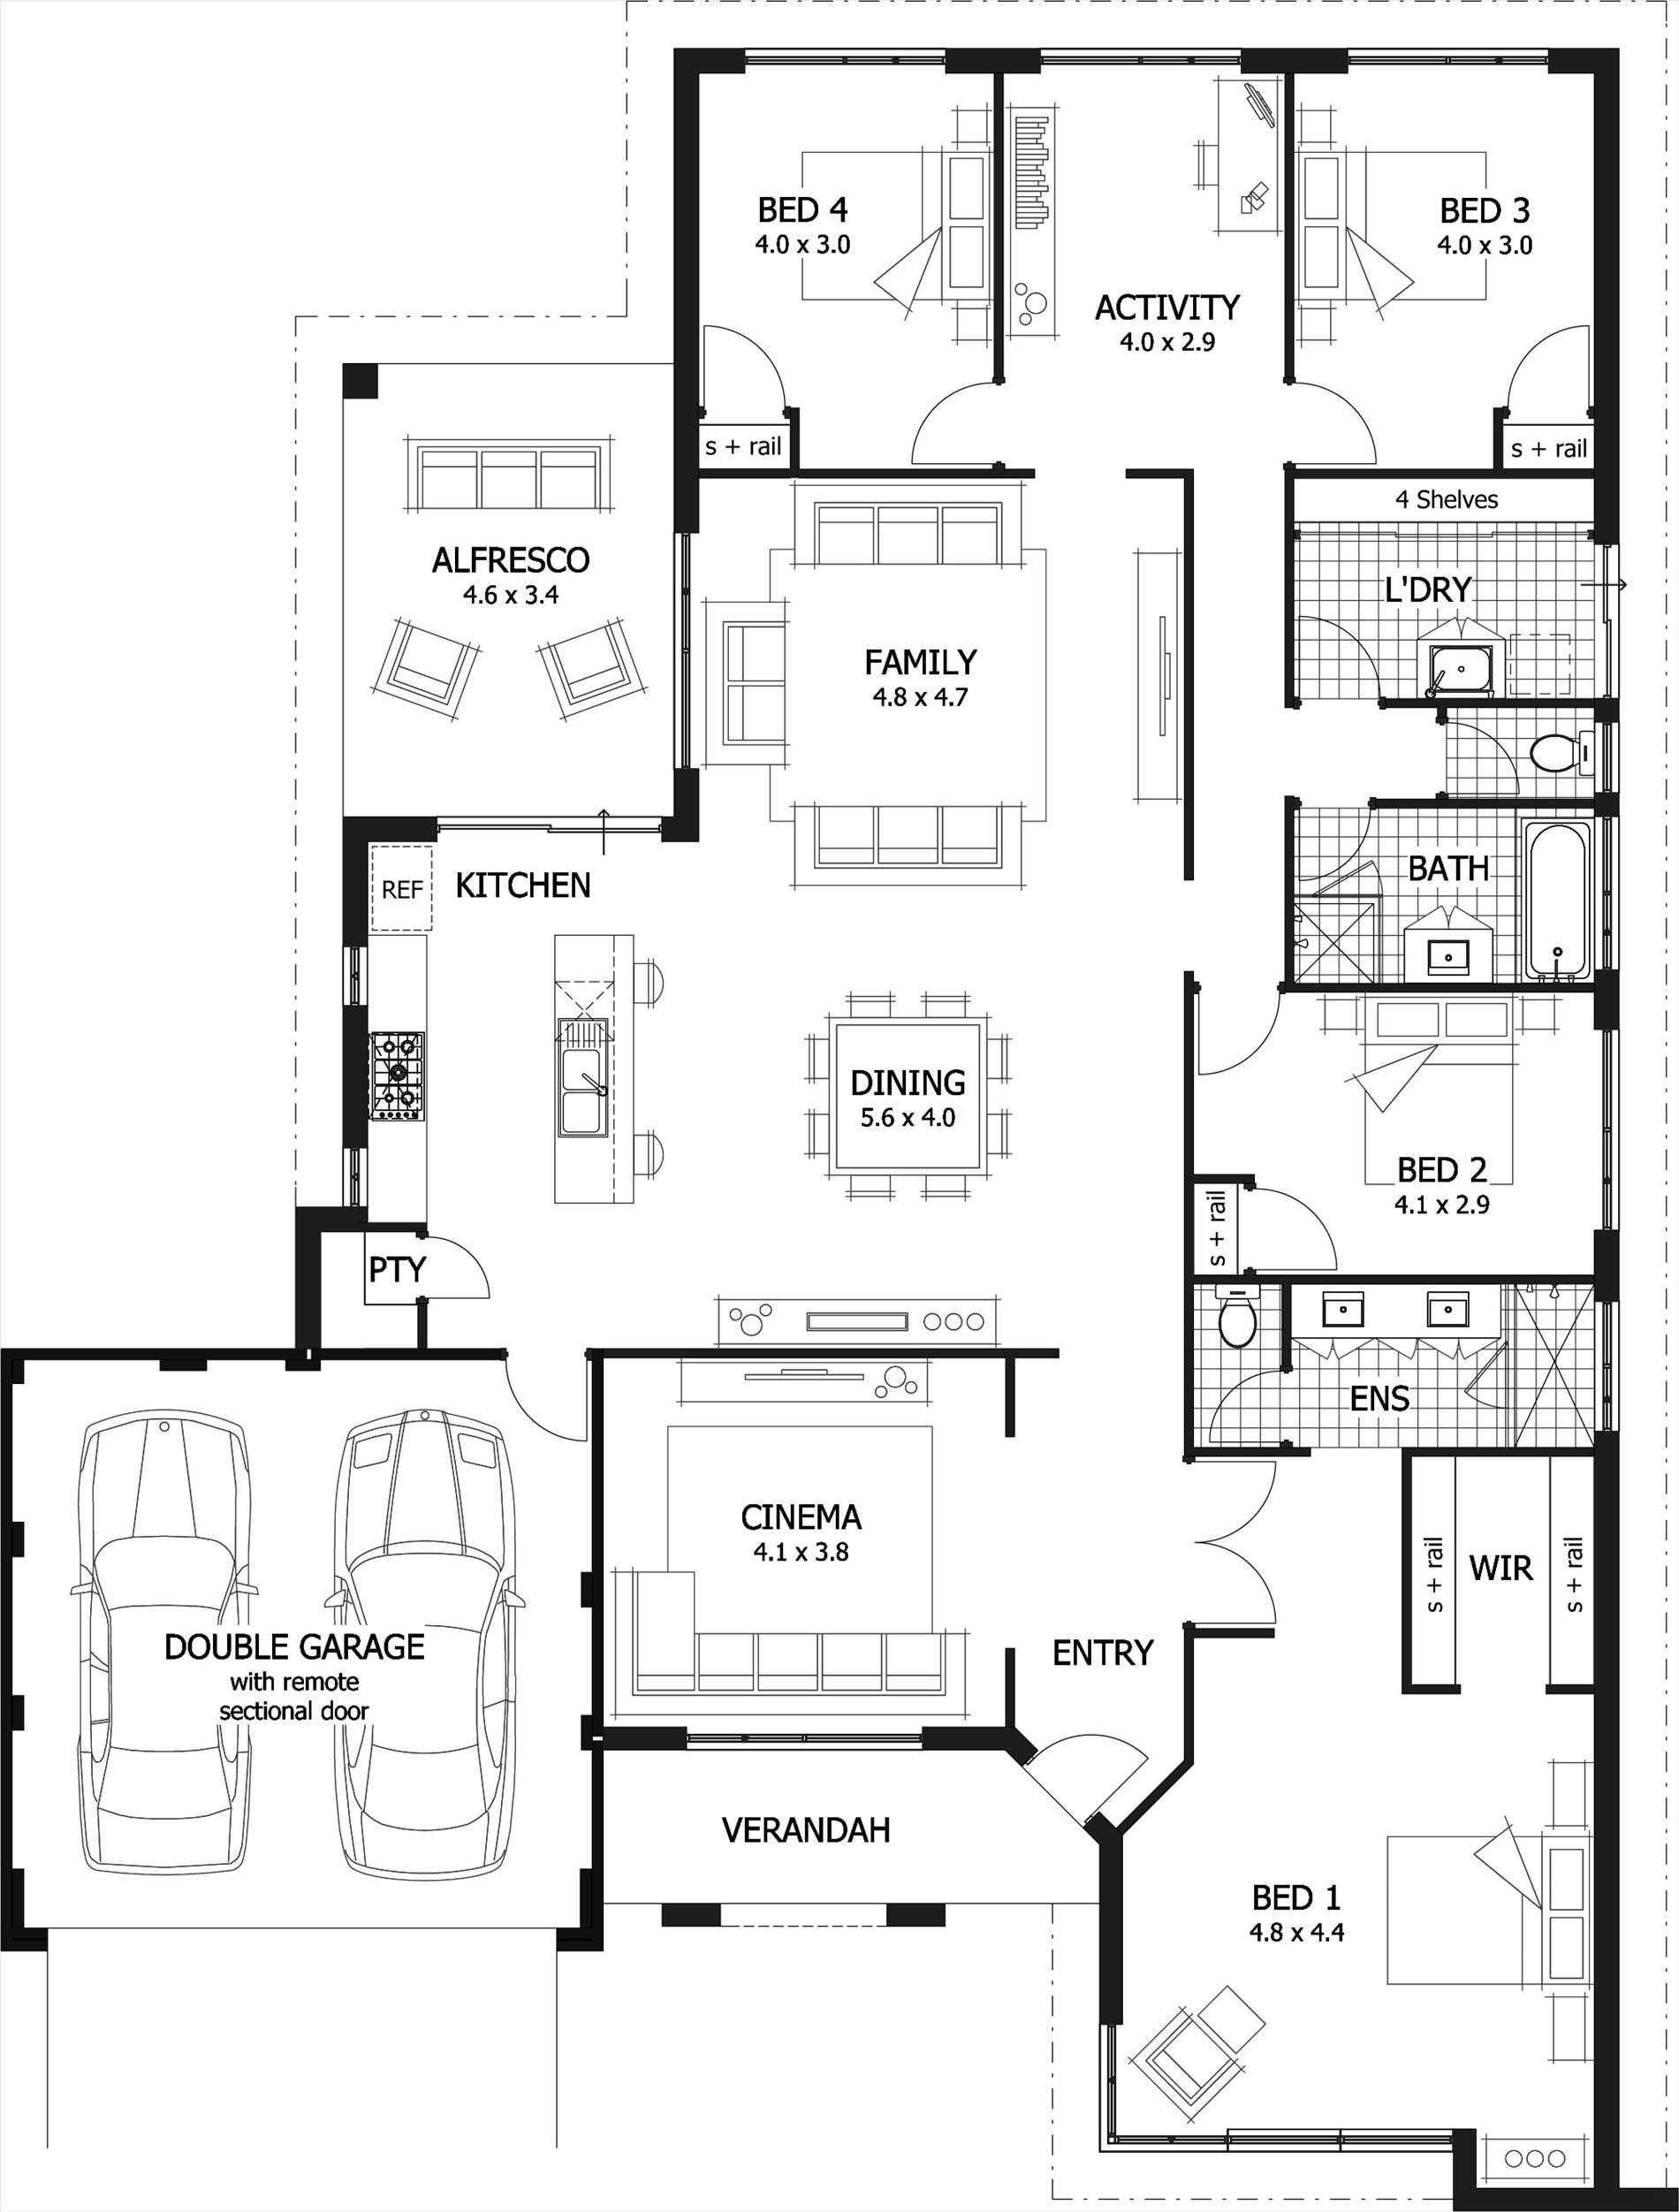 Home Decoration Flat Pilotschoolbanyuwangicom Plan Garage Apartment Plans 3 Bedroom Of Flat Pilot House Plans Australia 4 Bedroom House Plans Beach House Plans